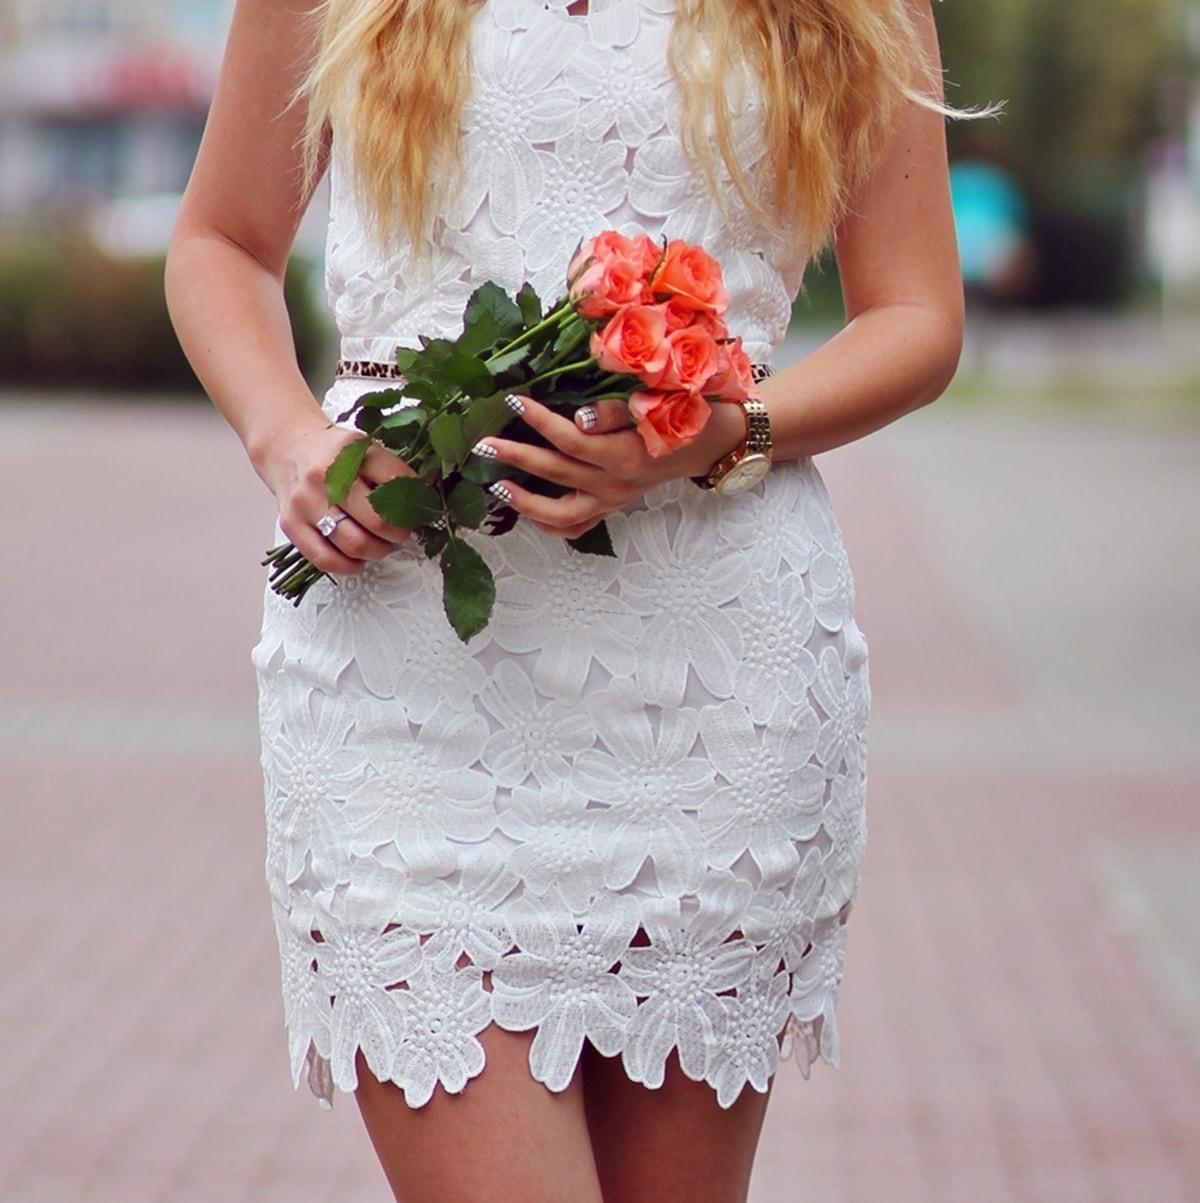 Buchet trandafiri portocalii, rochie alba dantela